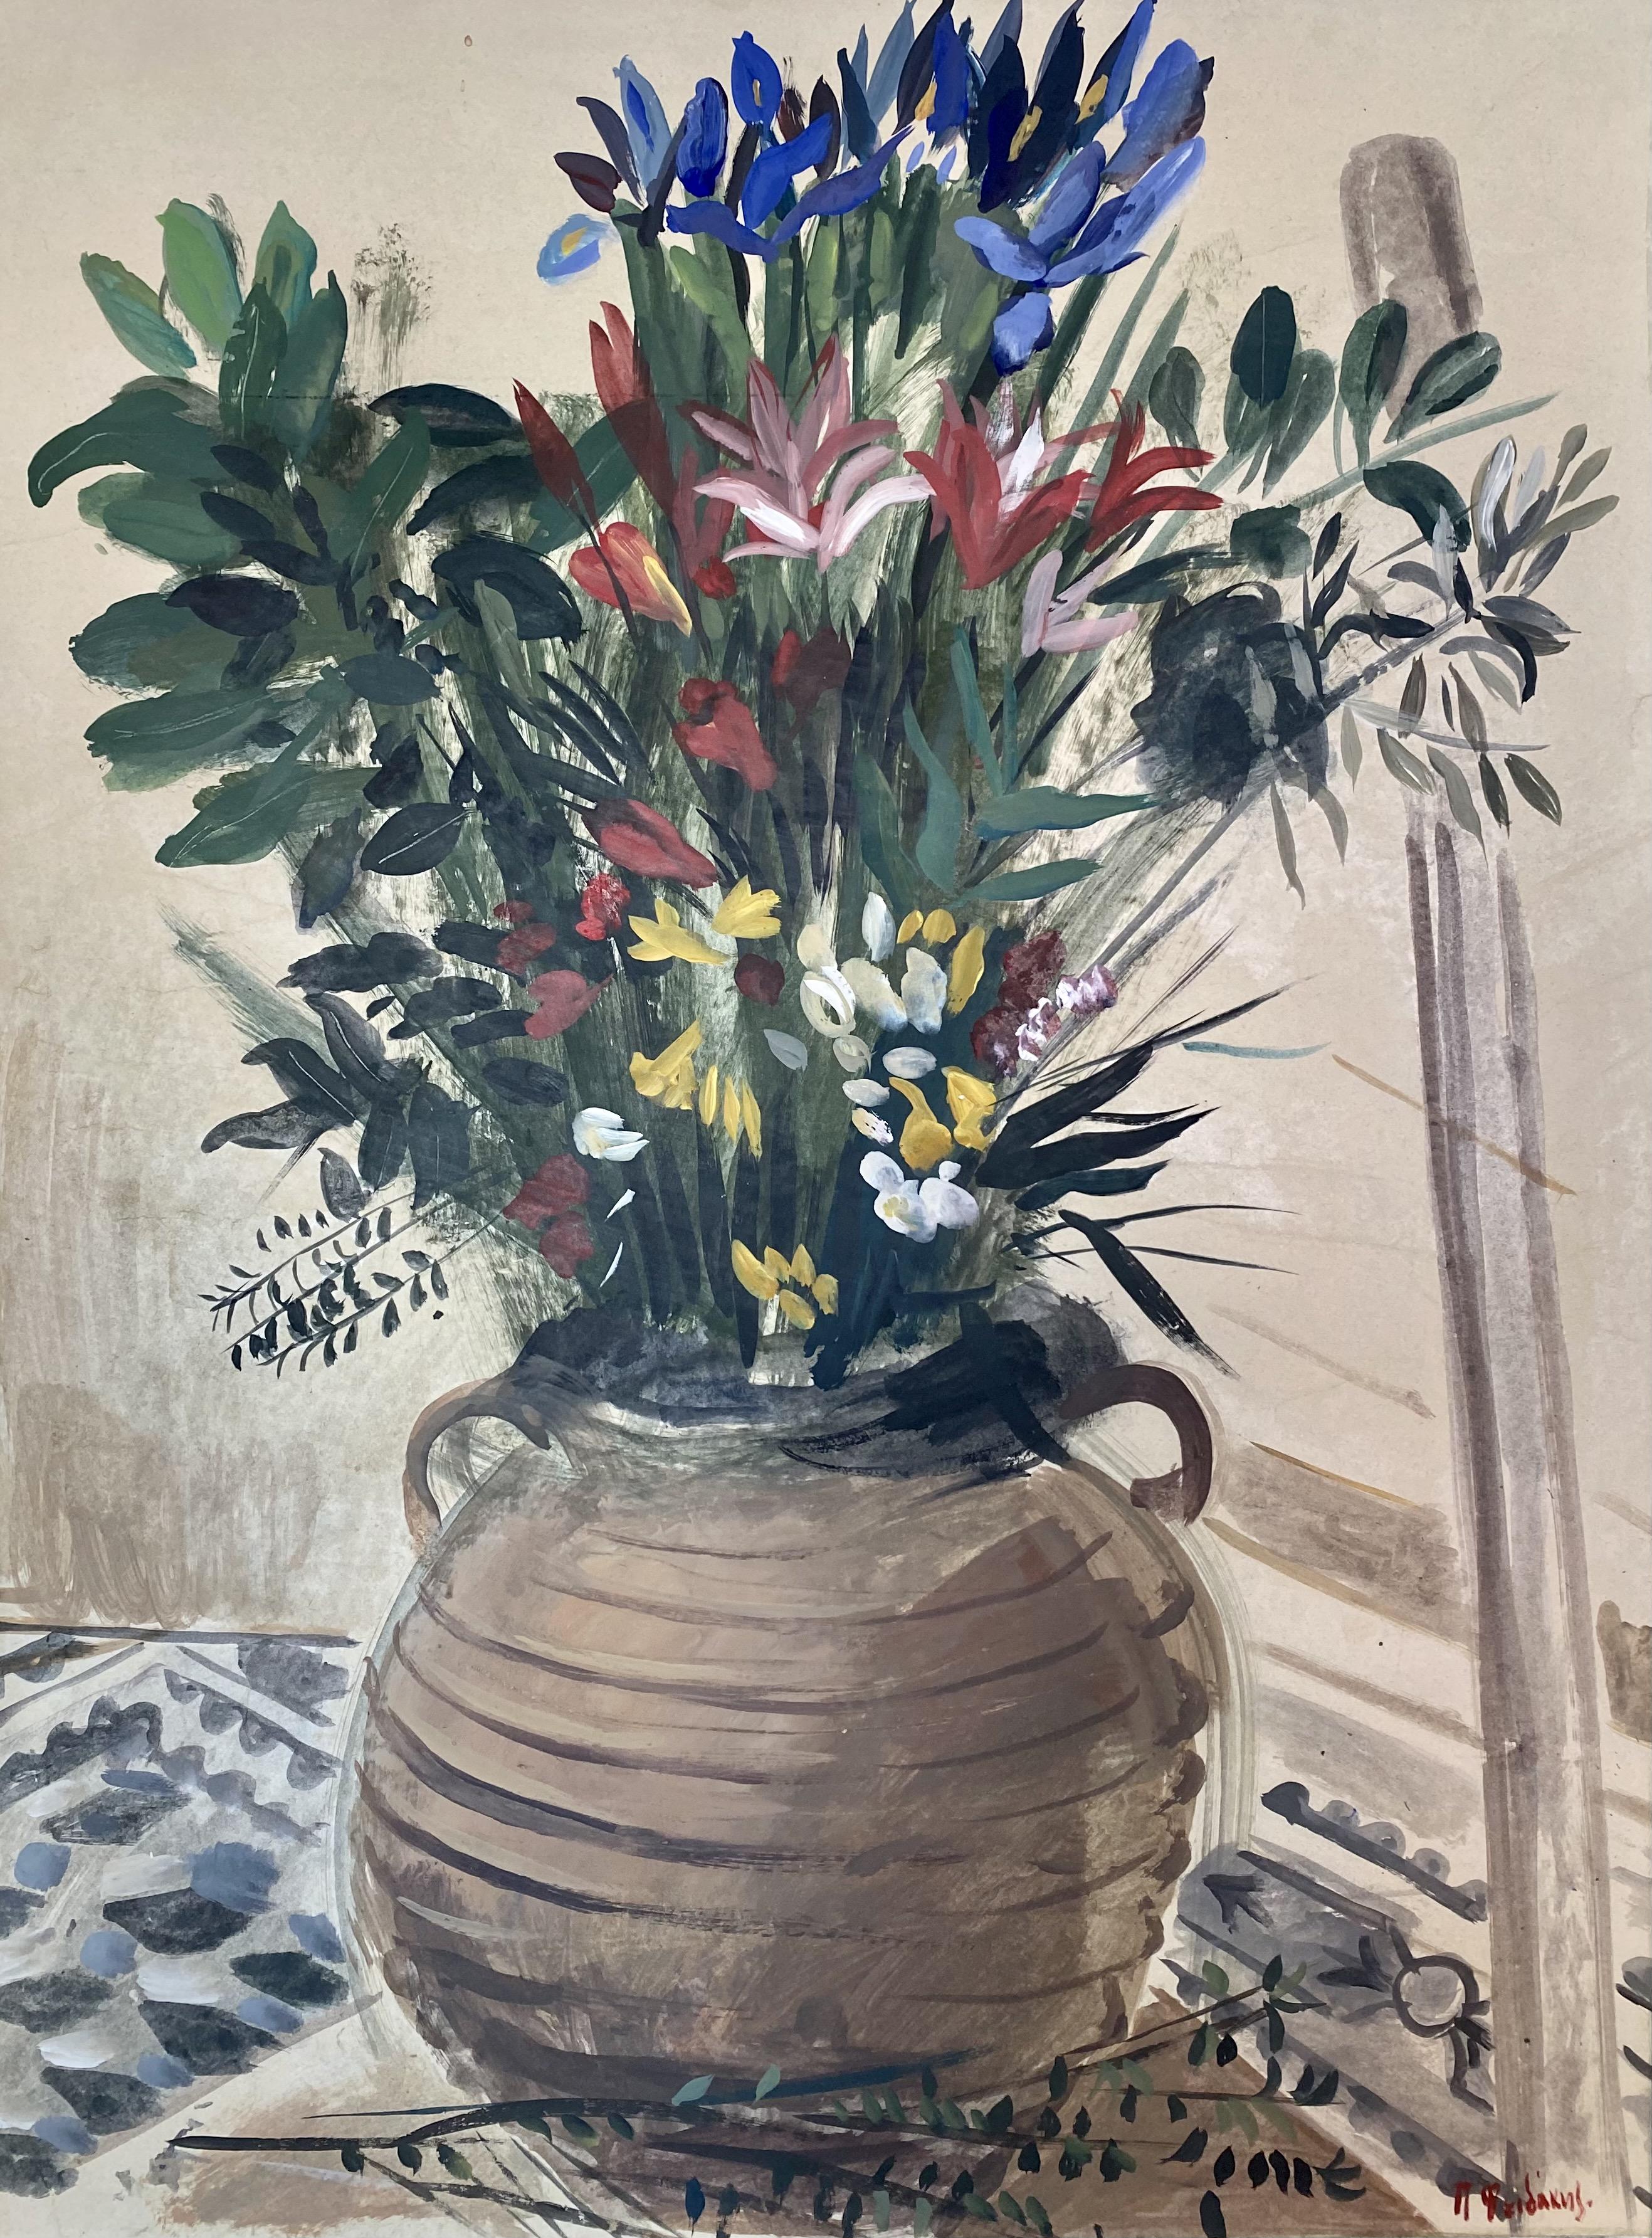 Panos Fidakis (Greek 1956-2003) (AR), Still life, oil on paper mount on canvas, 97 x 72 cm.